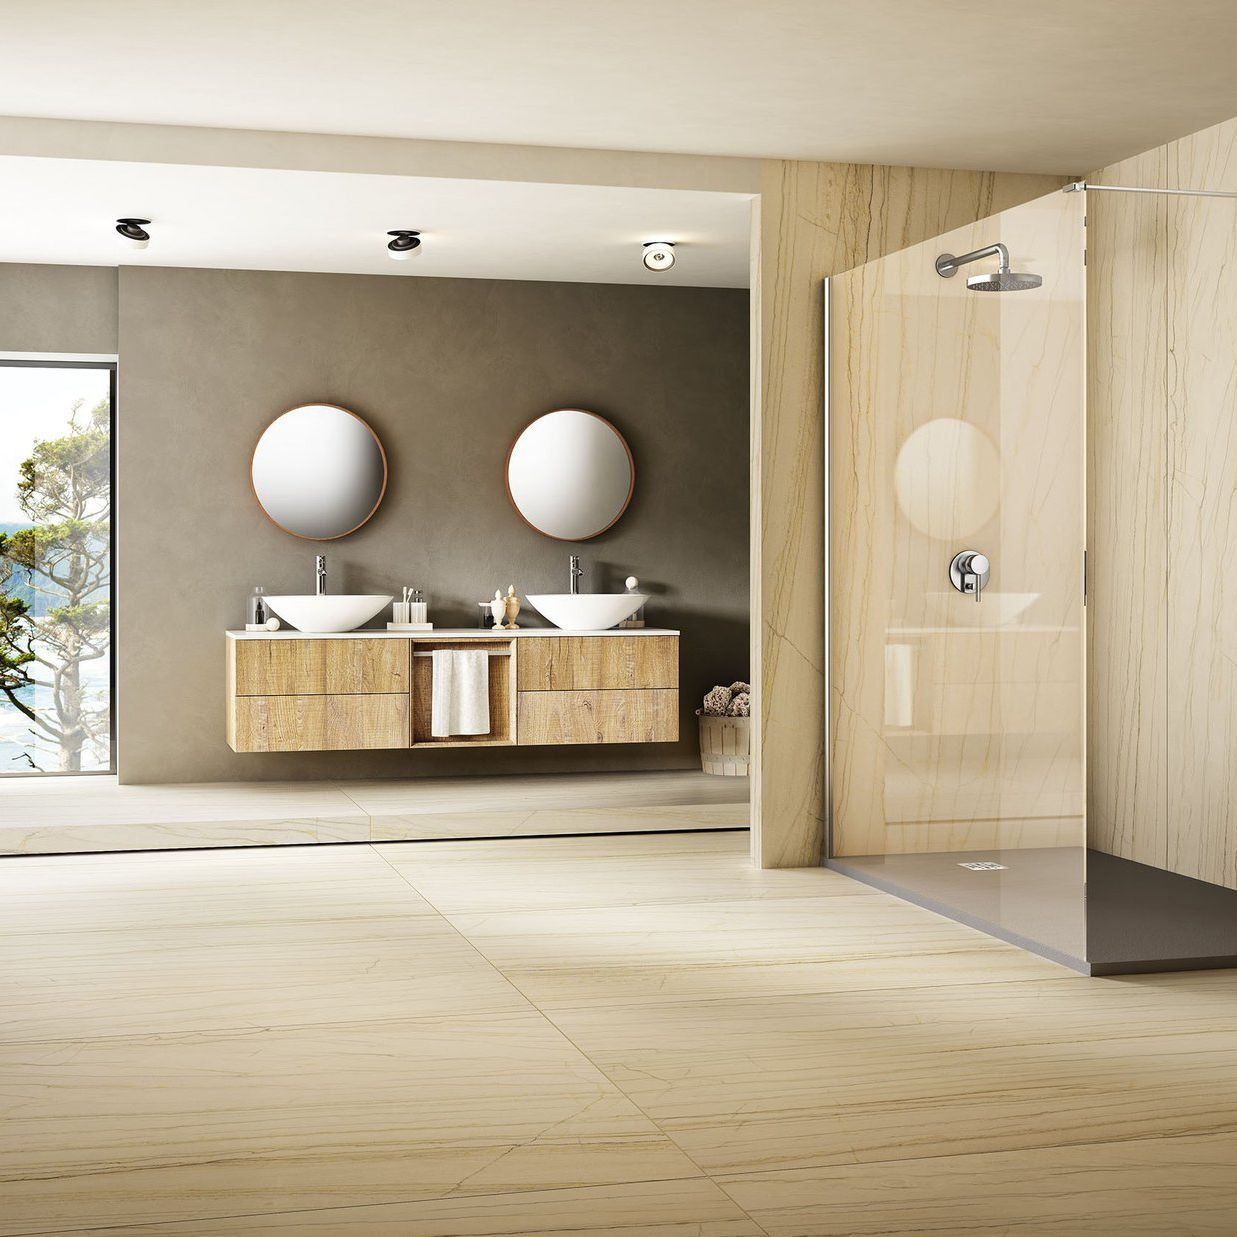 Indoor tile wall floor porcelain stoneware maximus indoor tile wall floor porcelain stoneware maximus macaubas dailygadgetfo Image collections